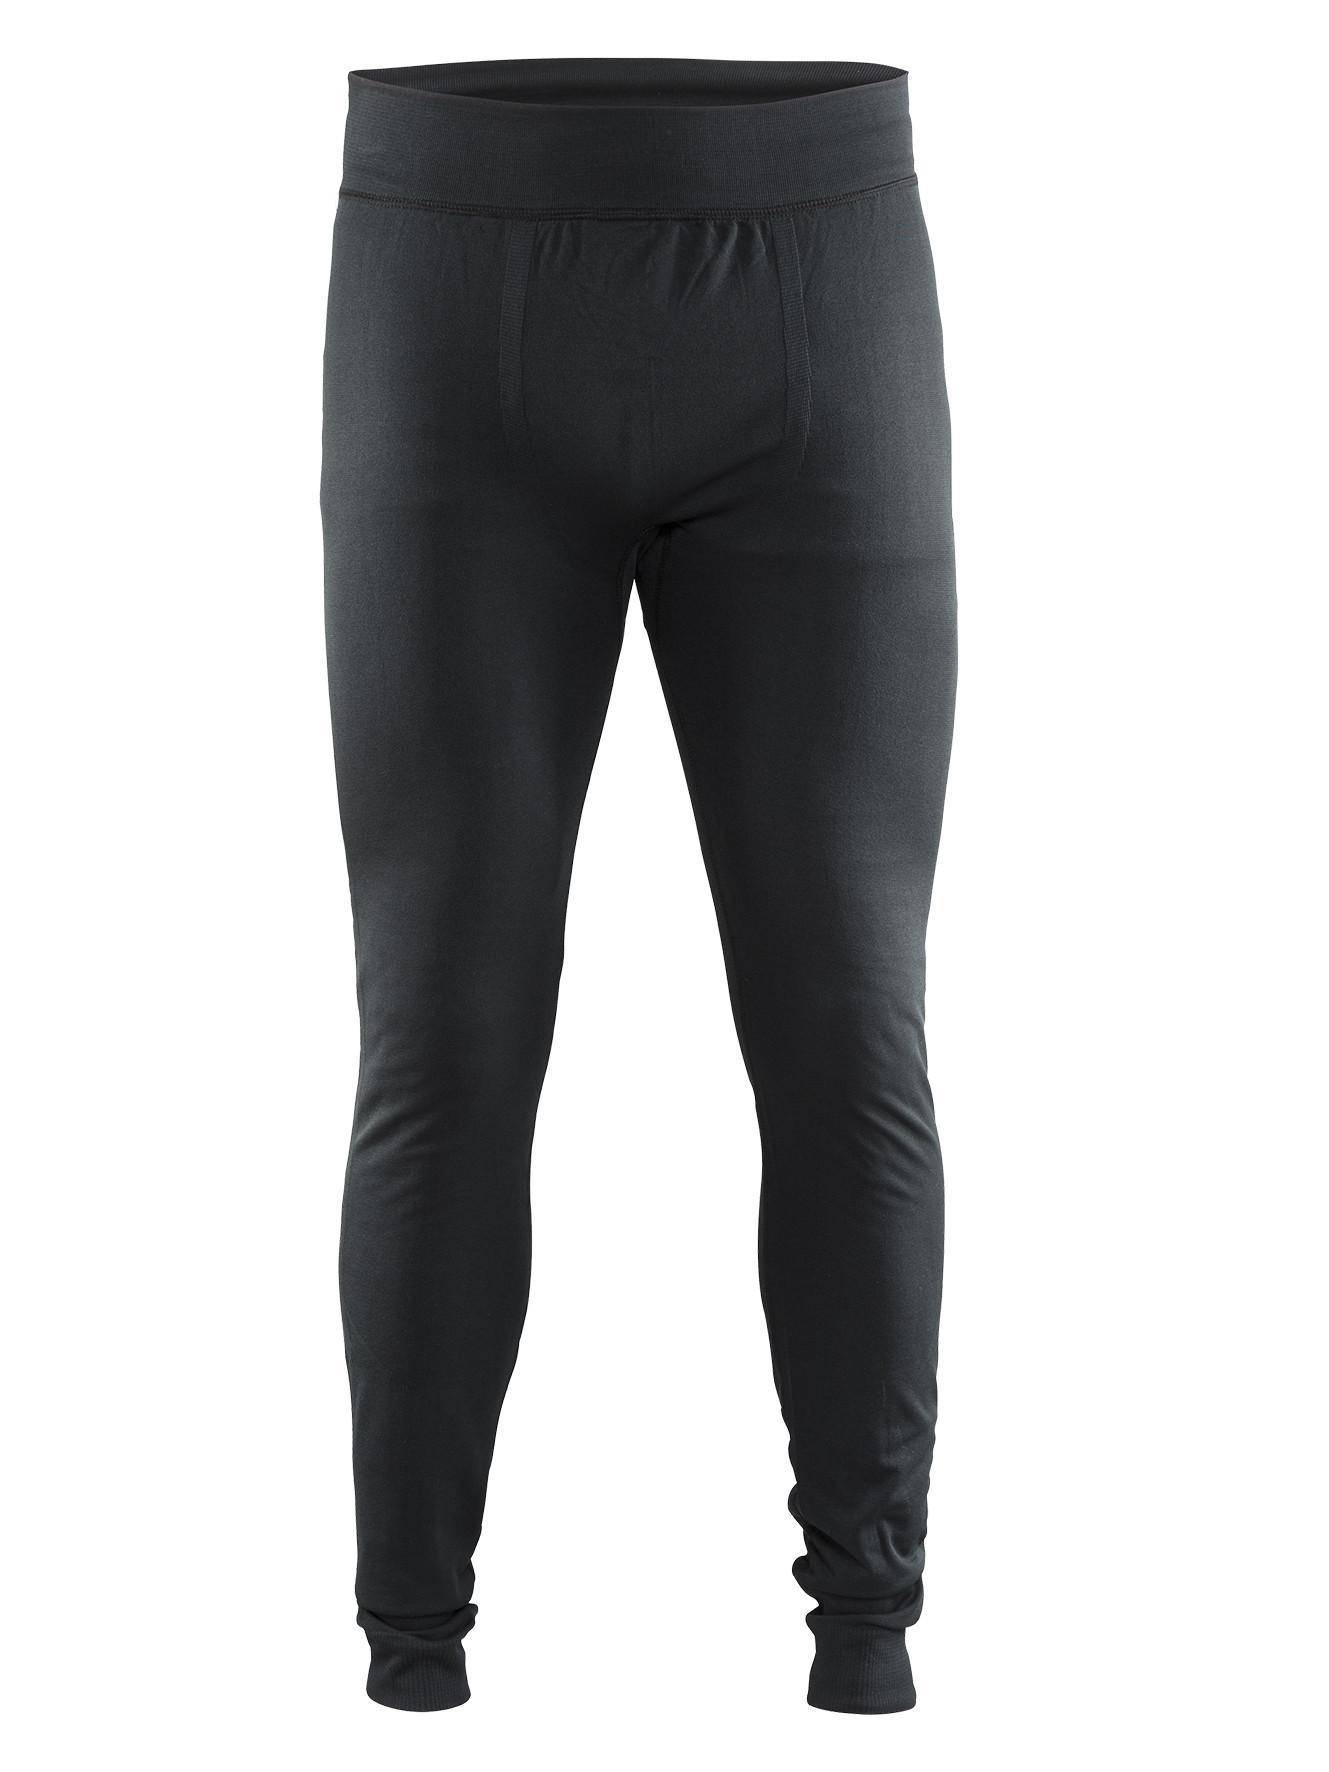 Термоштаны Craft Active Comfort Pants Man Black Solid M